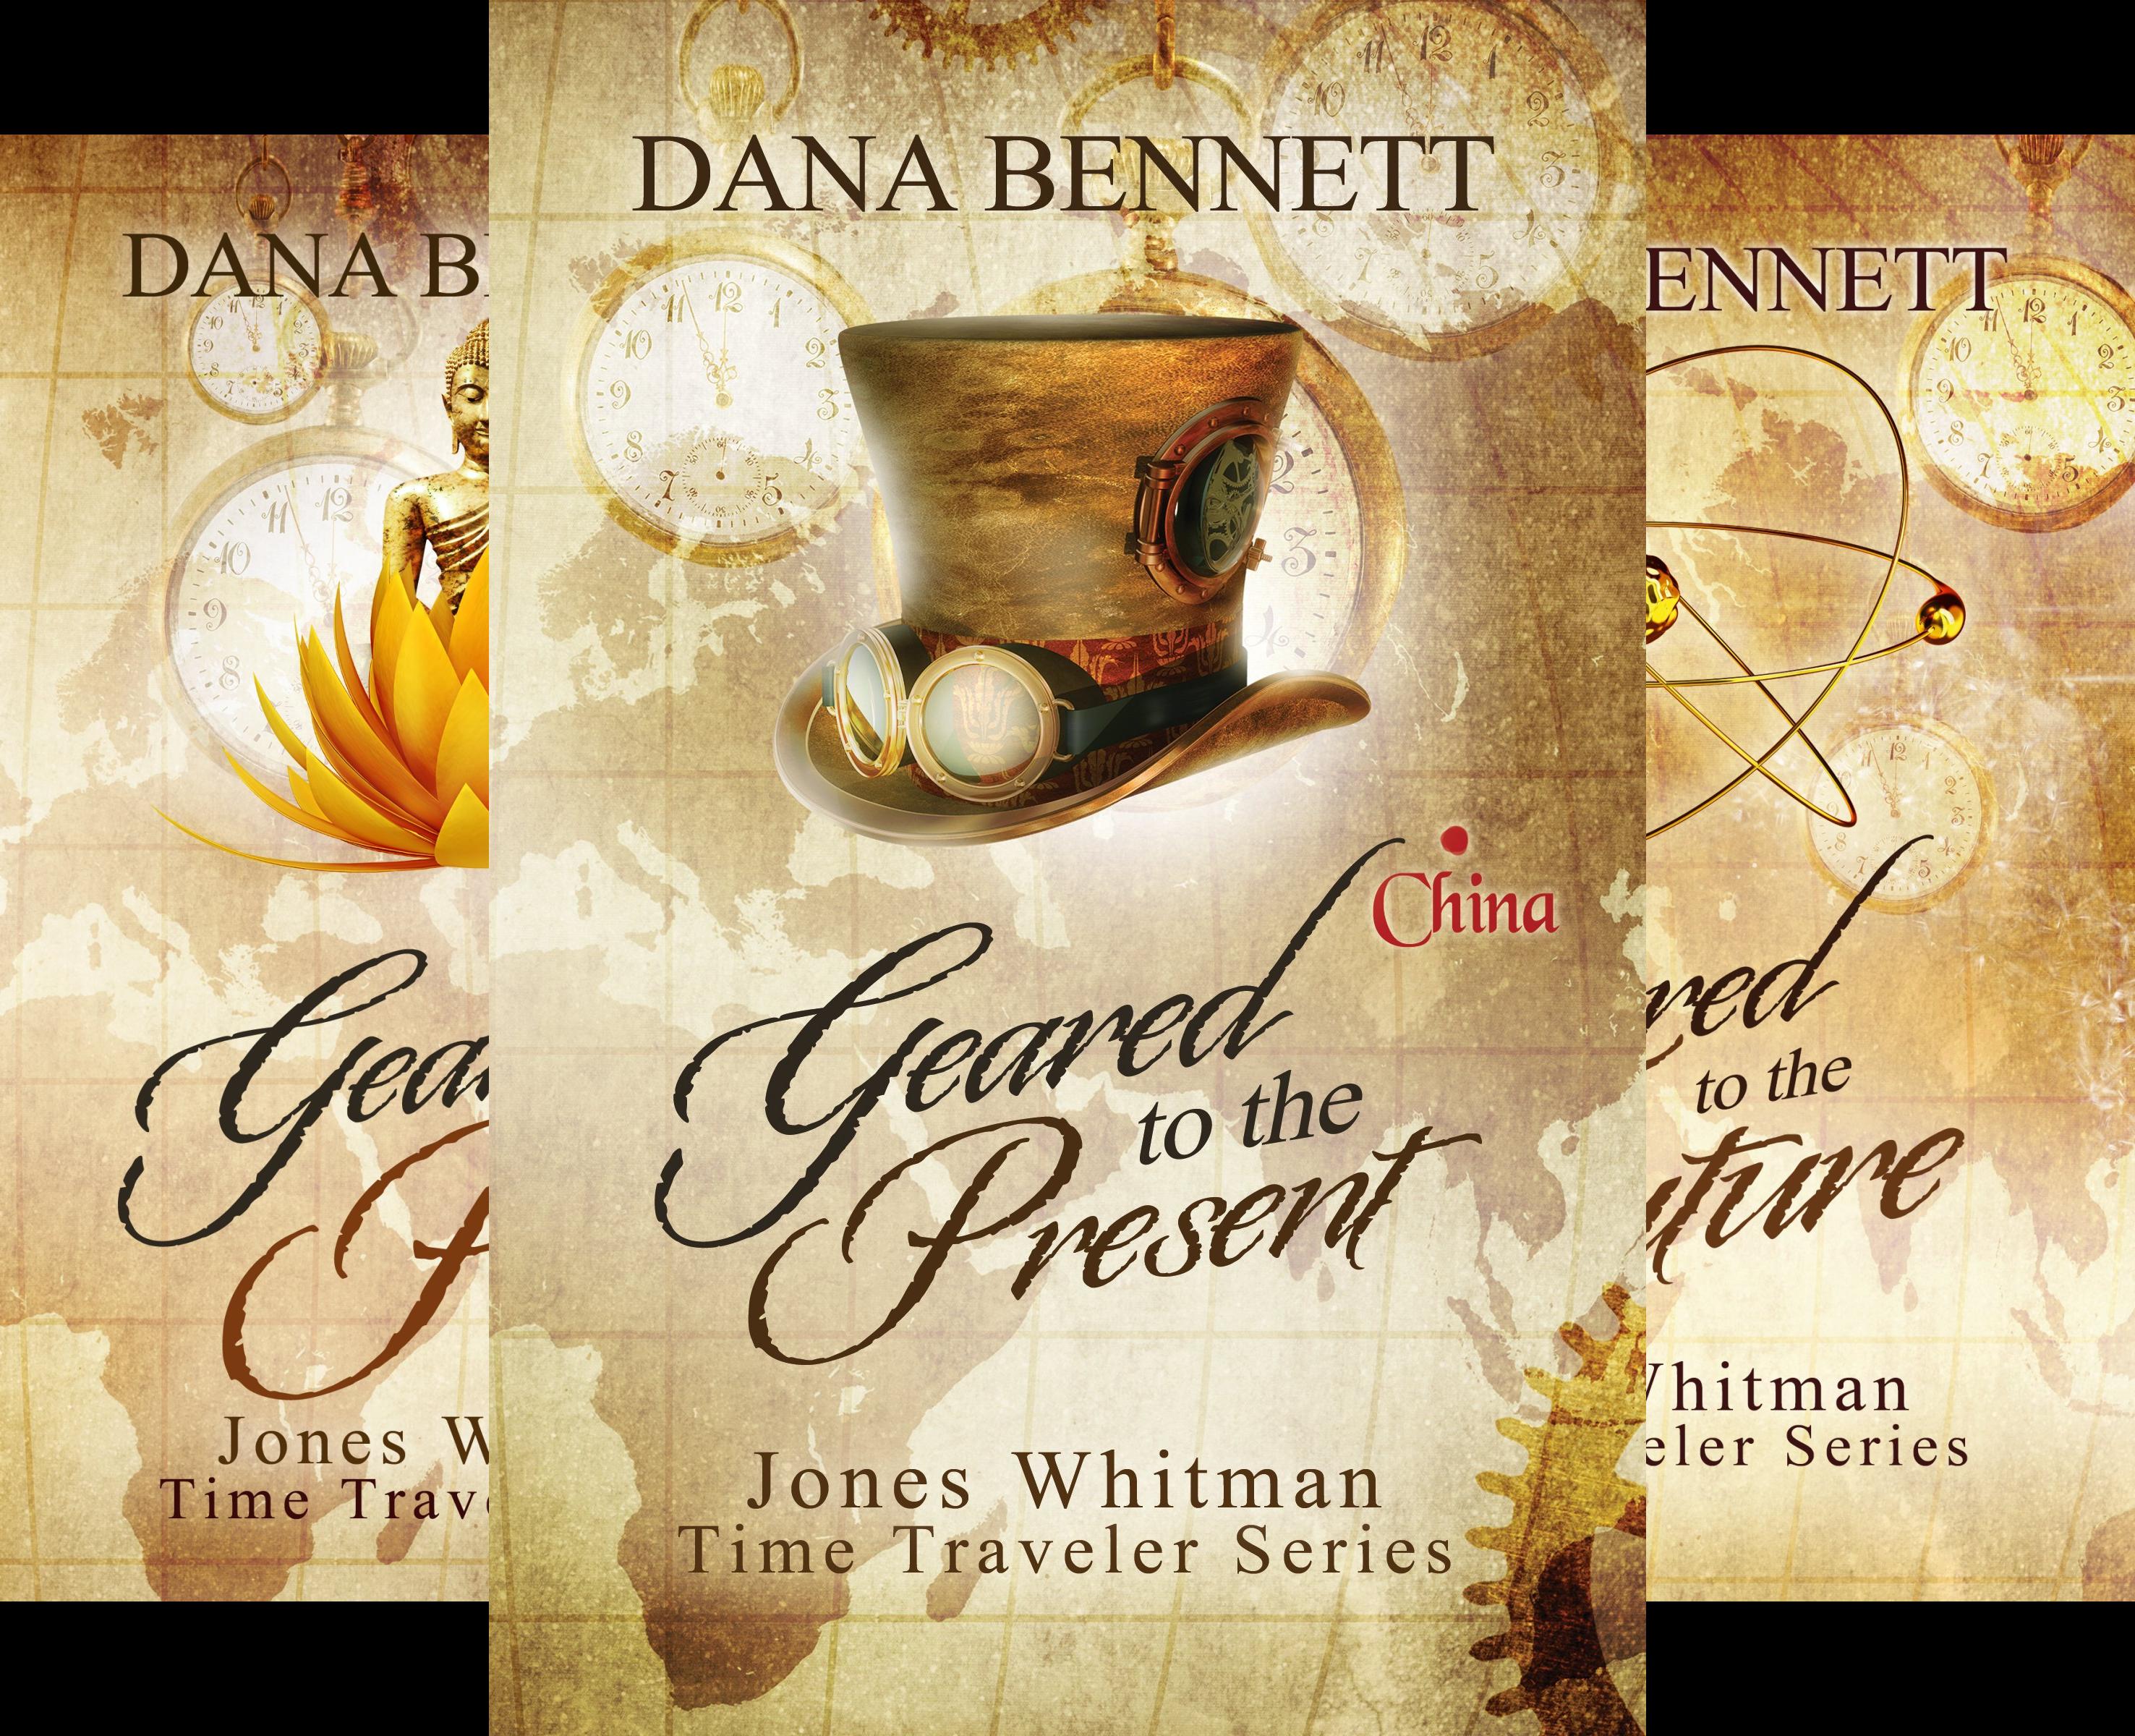 Jones Whitman Time Traveler Series (3 Book Series)